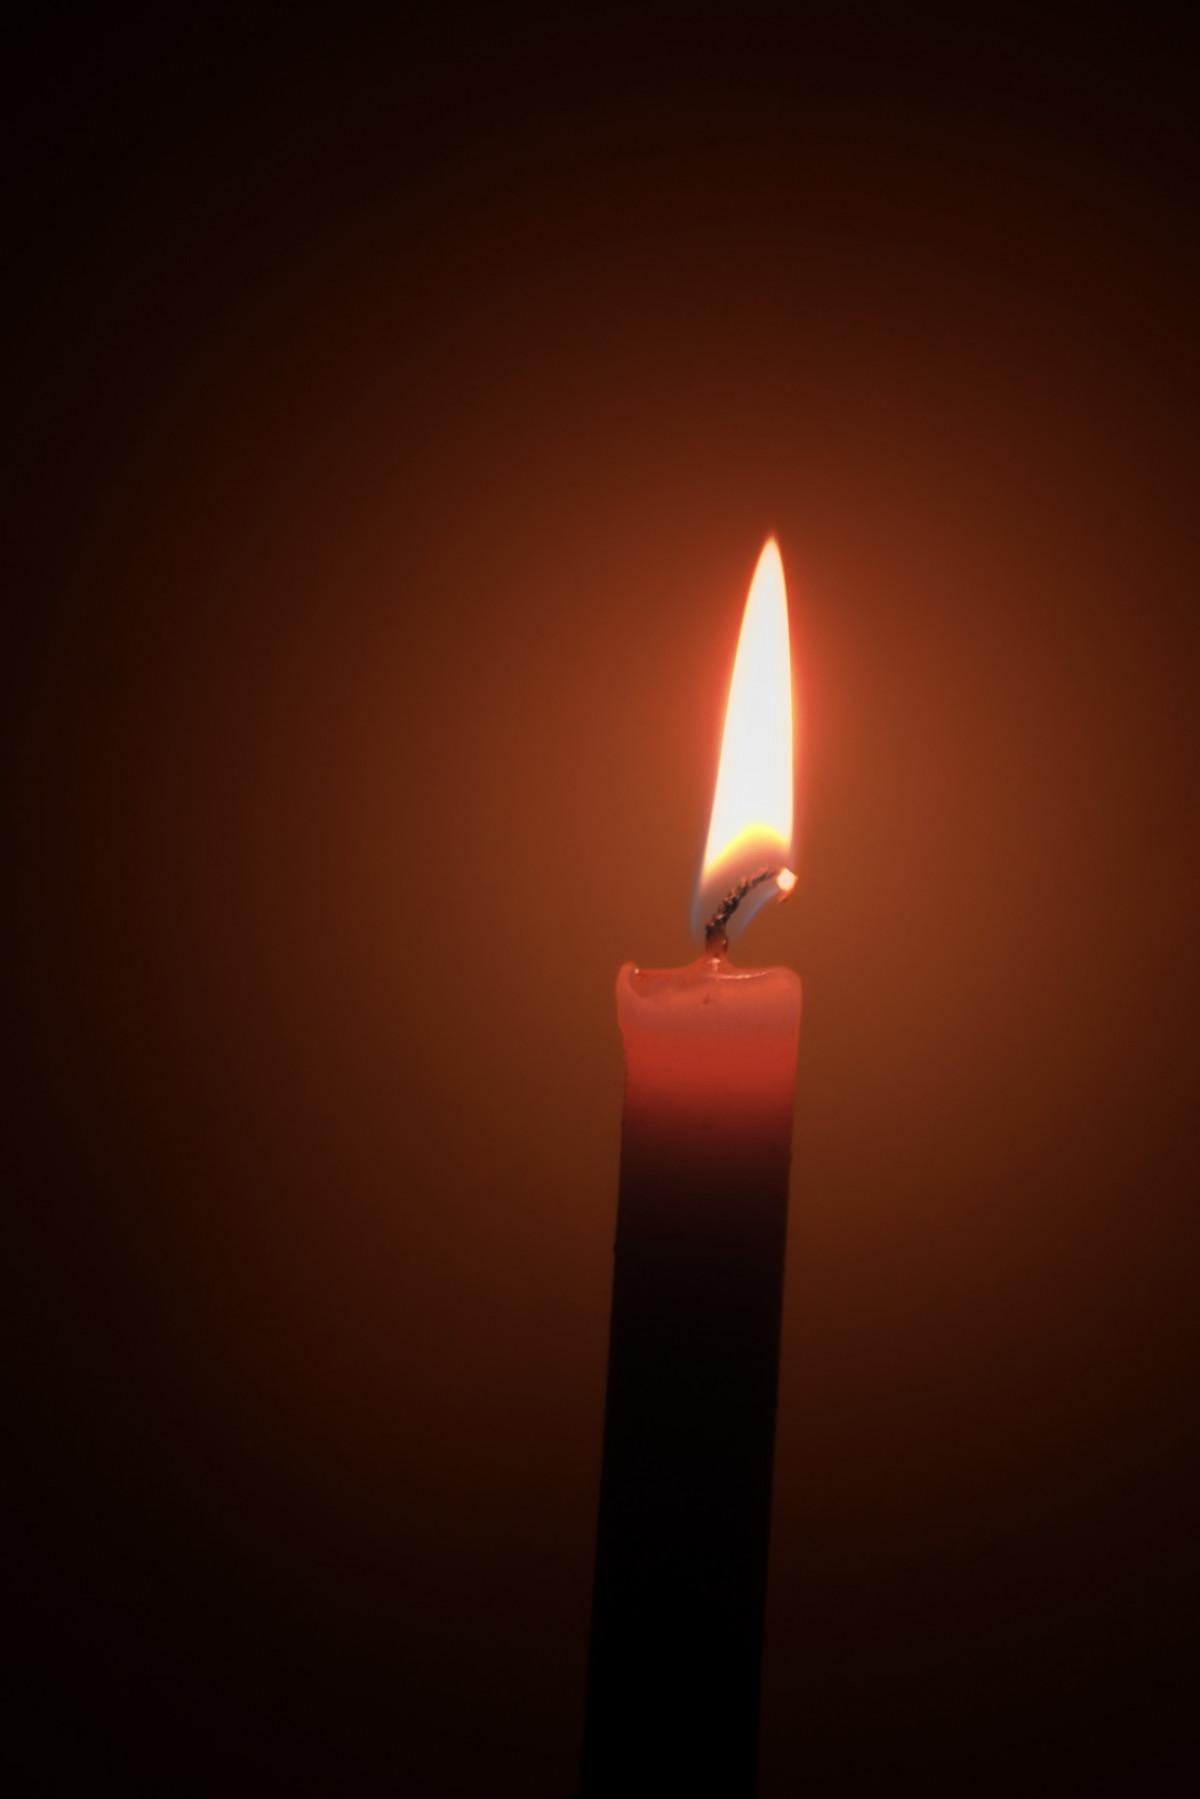 Free Images   Light  Petal  Dark  Shine  Flame  Darkness